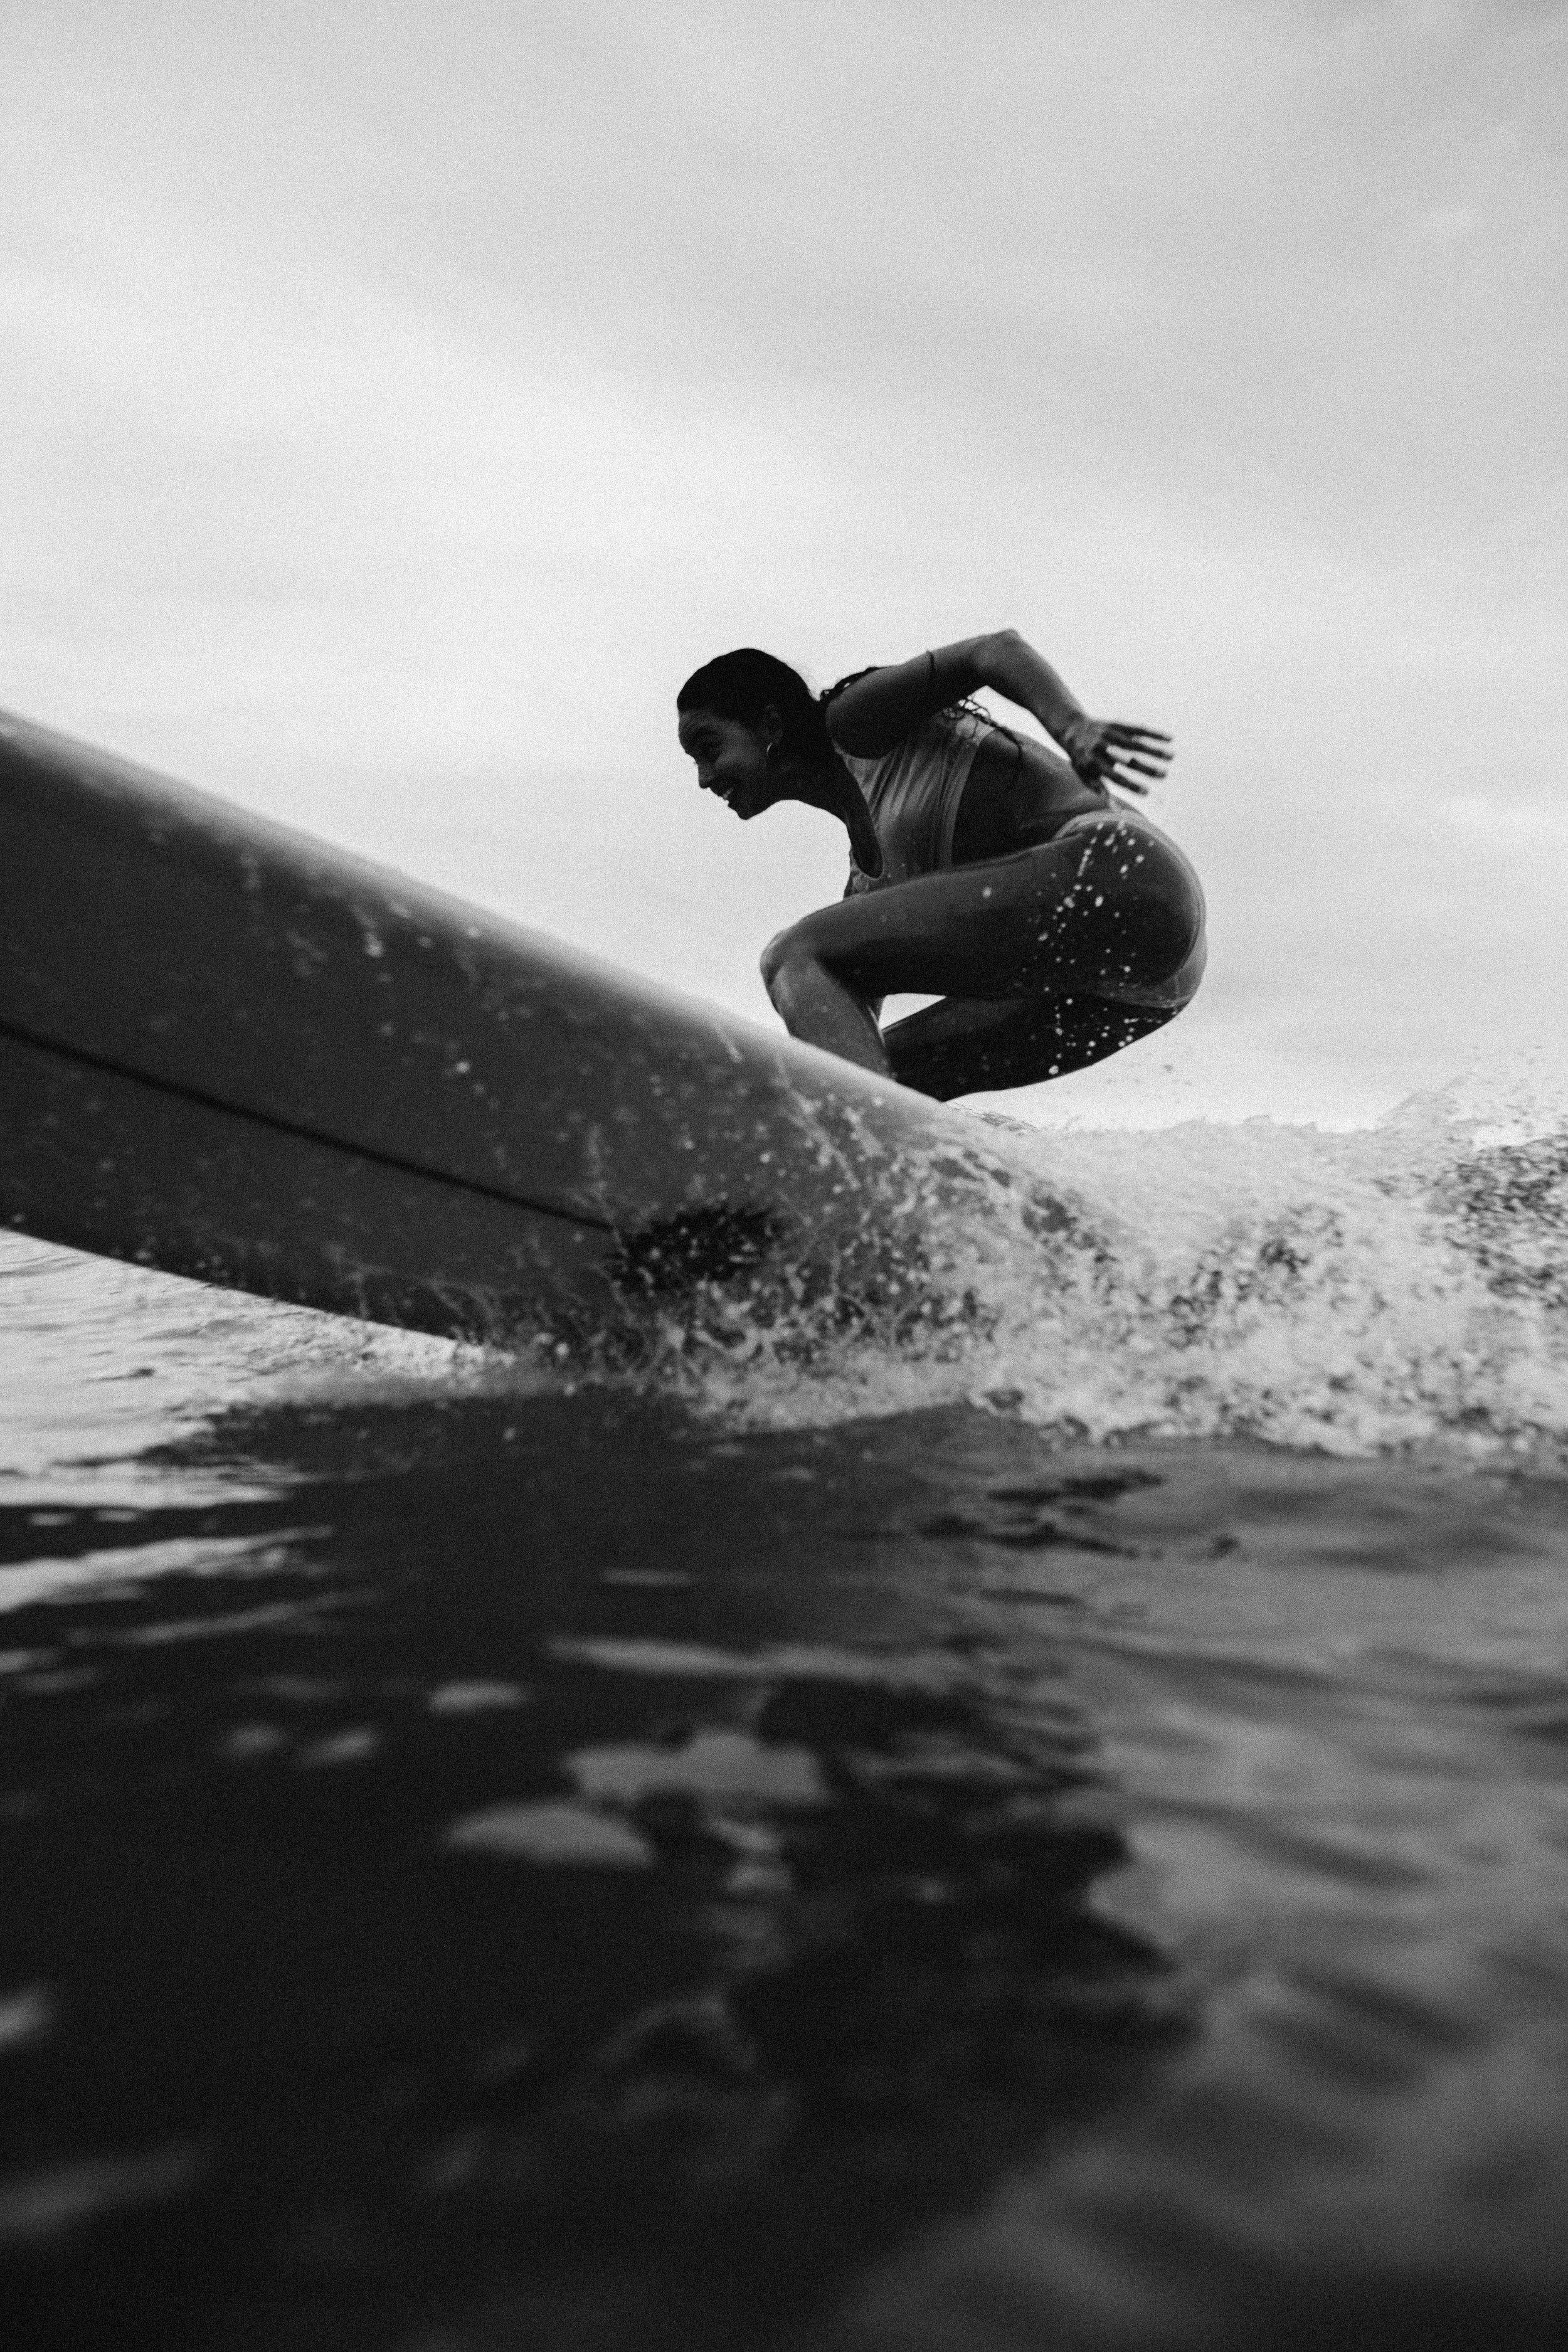 Fabien_Voileau_X_Laure_Myr_Surf_13.jpg